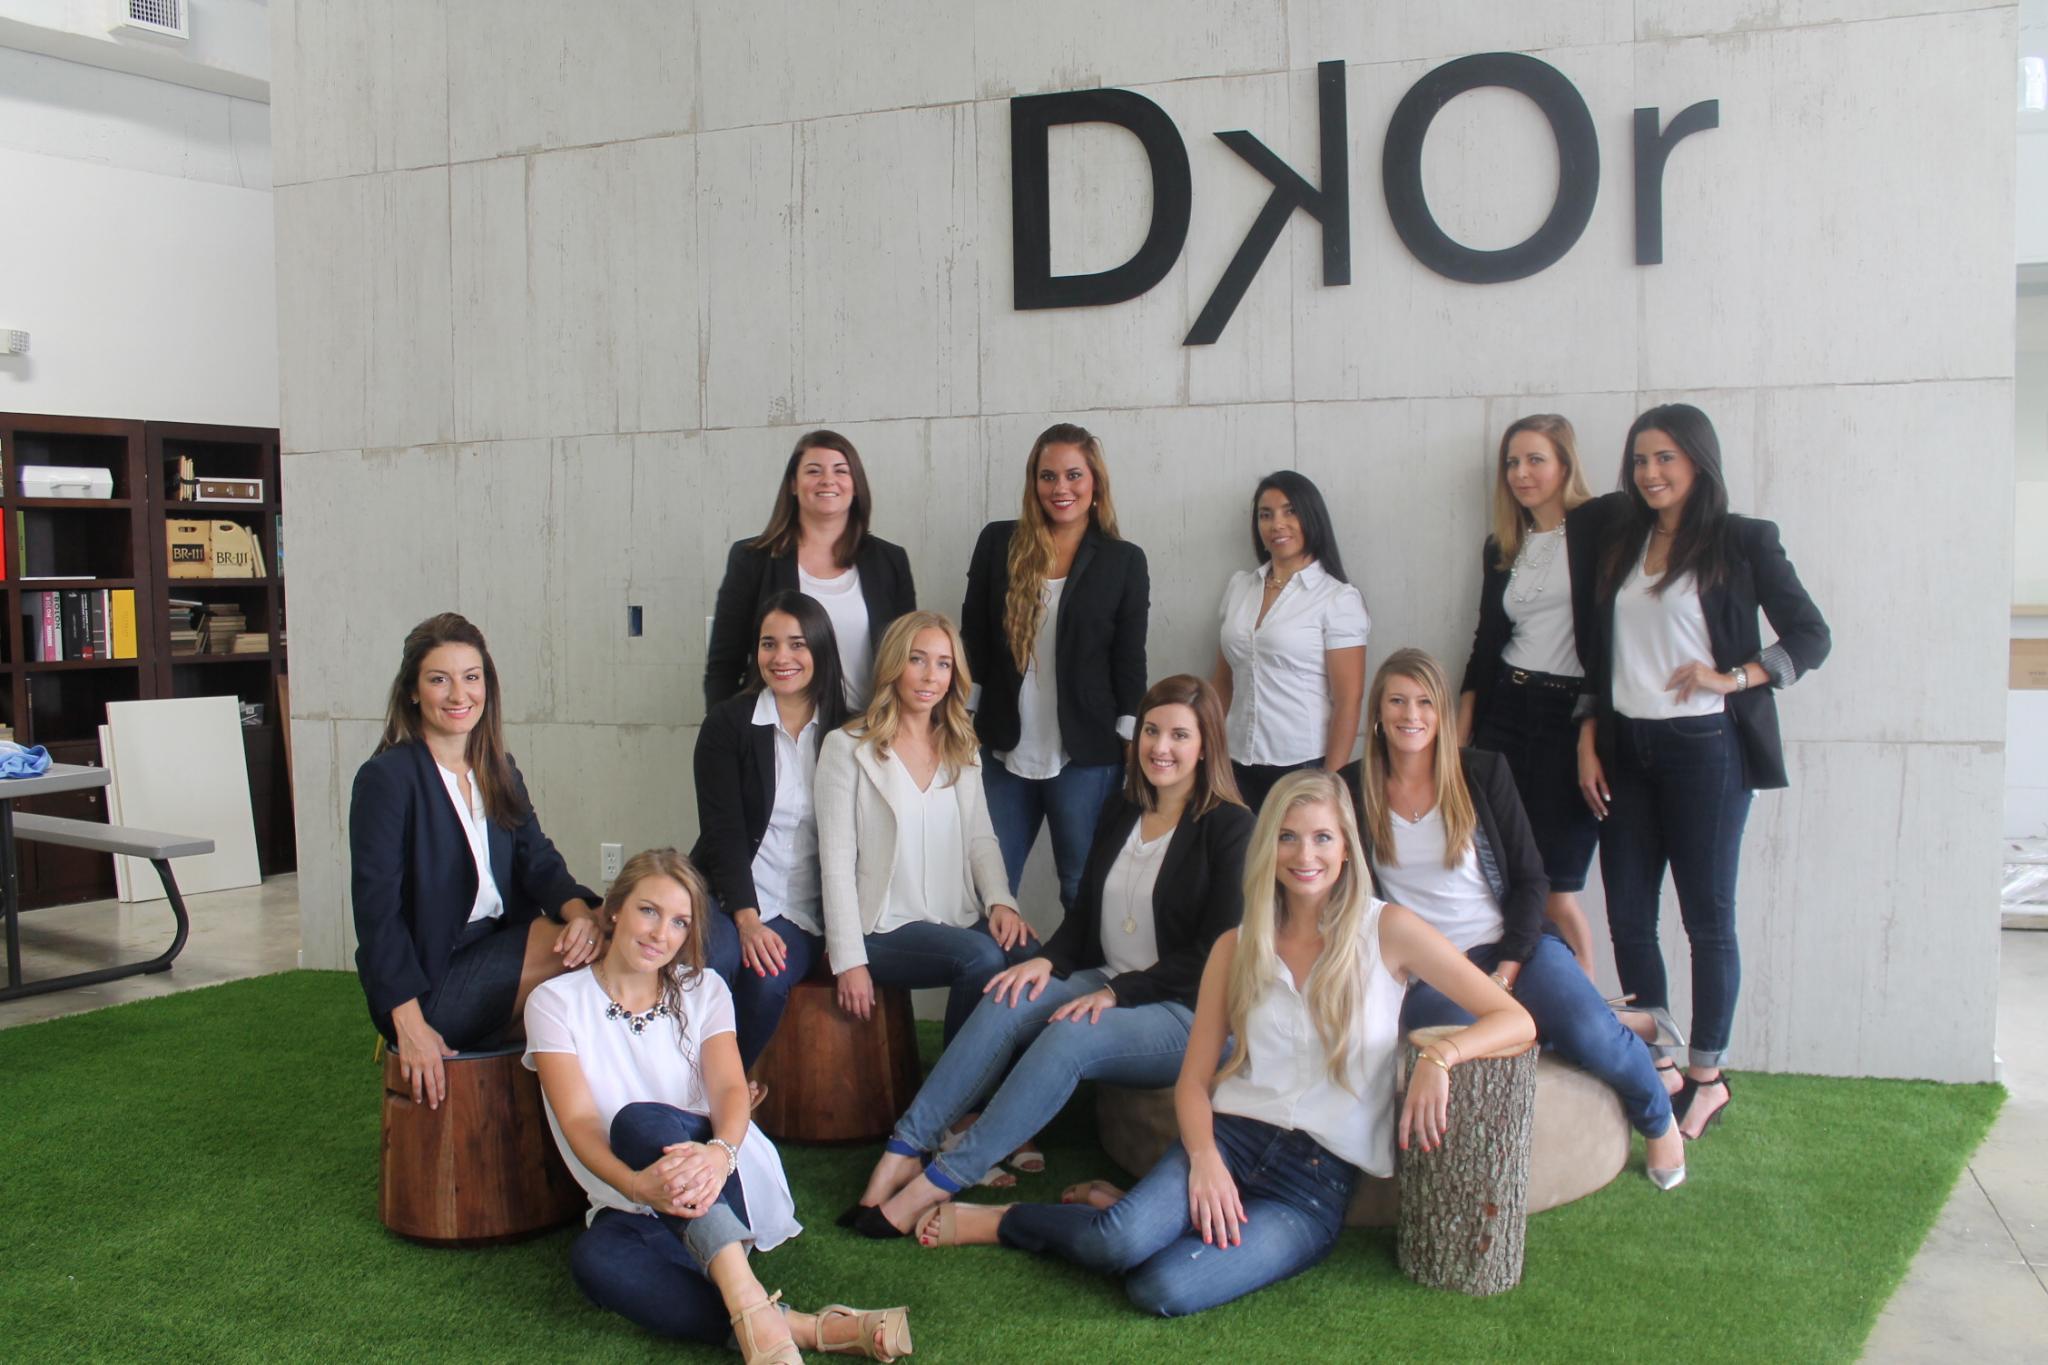 Today's Guest Blogger, Dkor Interiors, Talks Miami Design